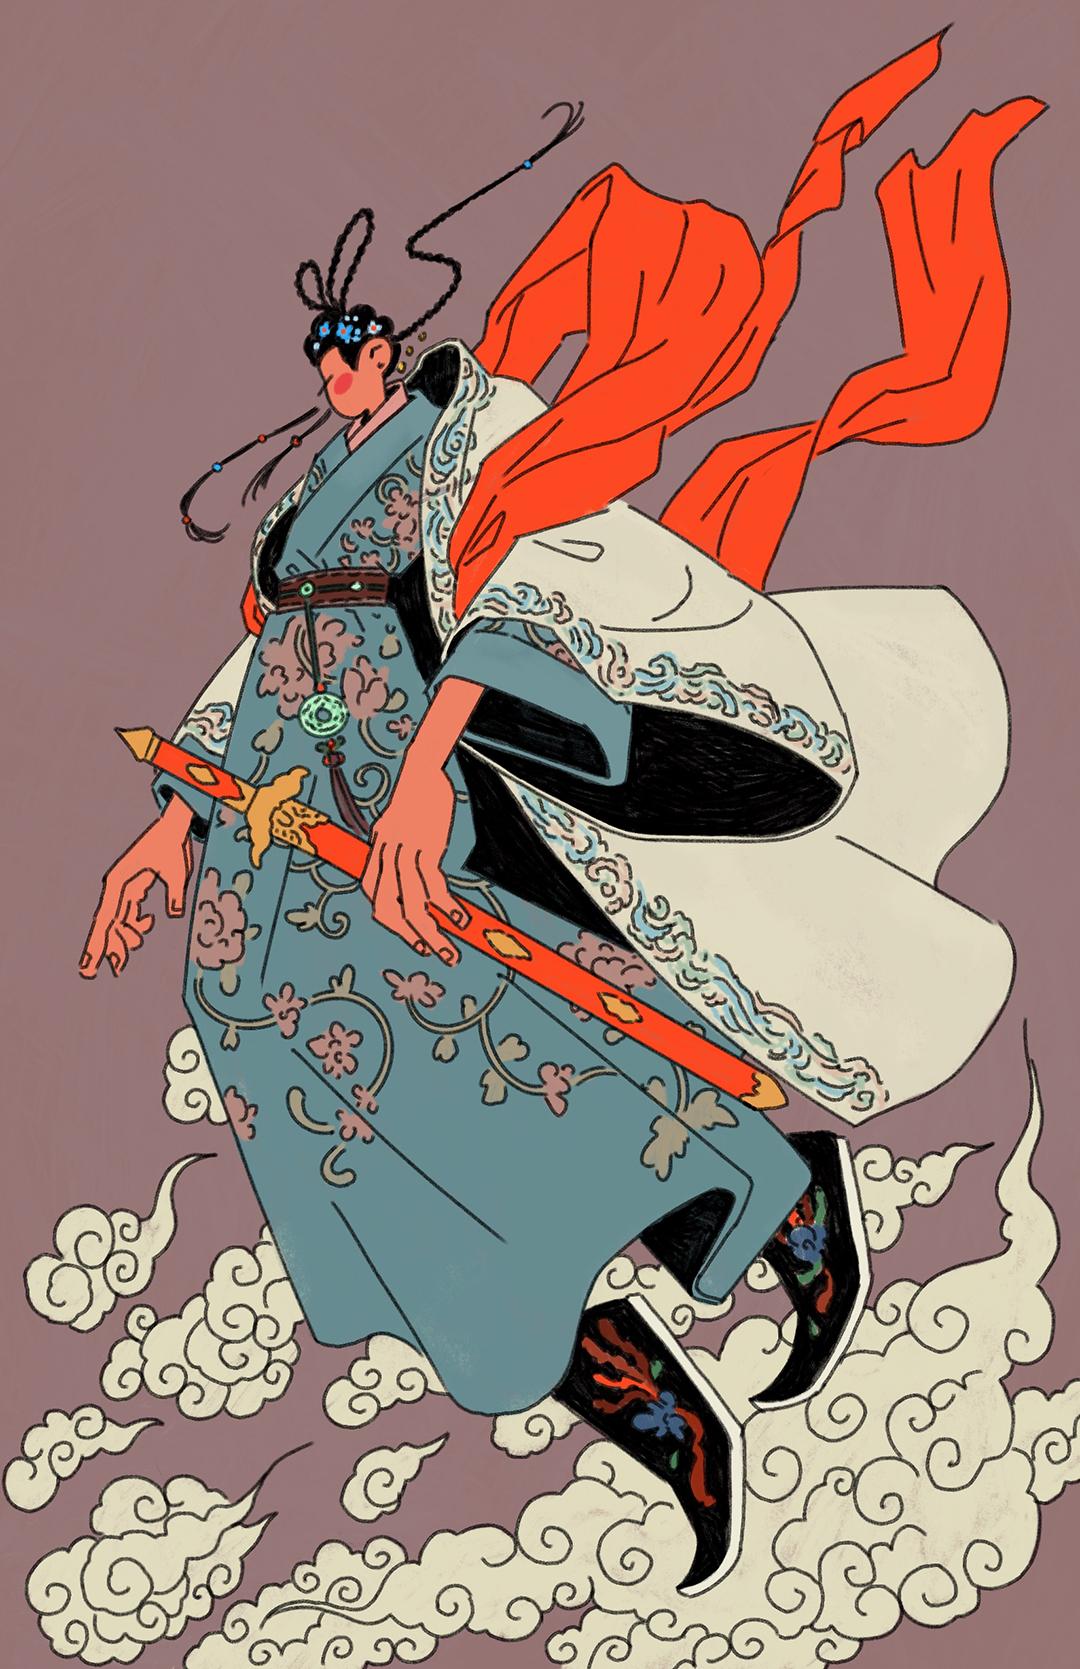 GirlsclubAsia-Illustrator-Sarula Bao-IntheClouds